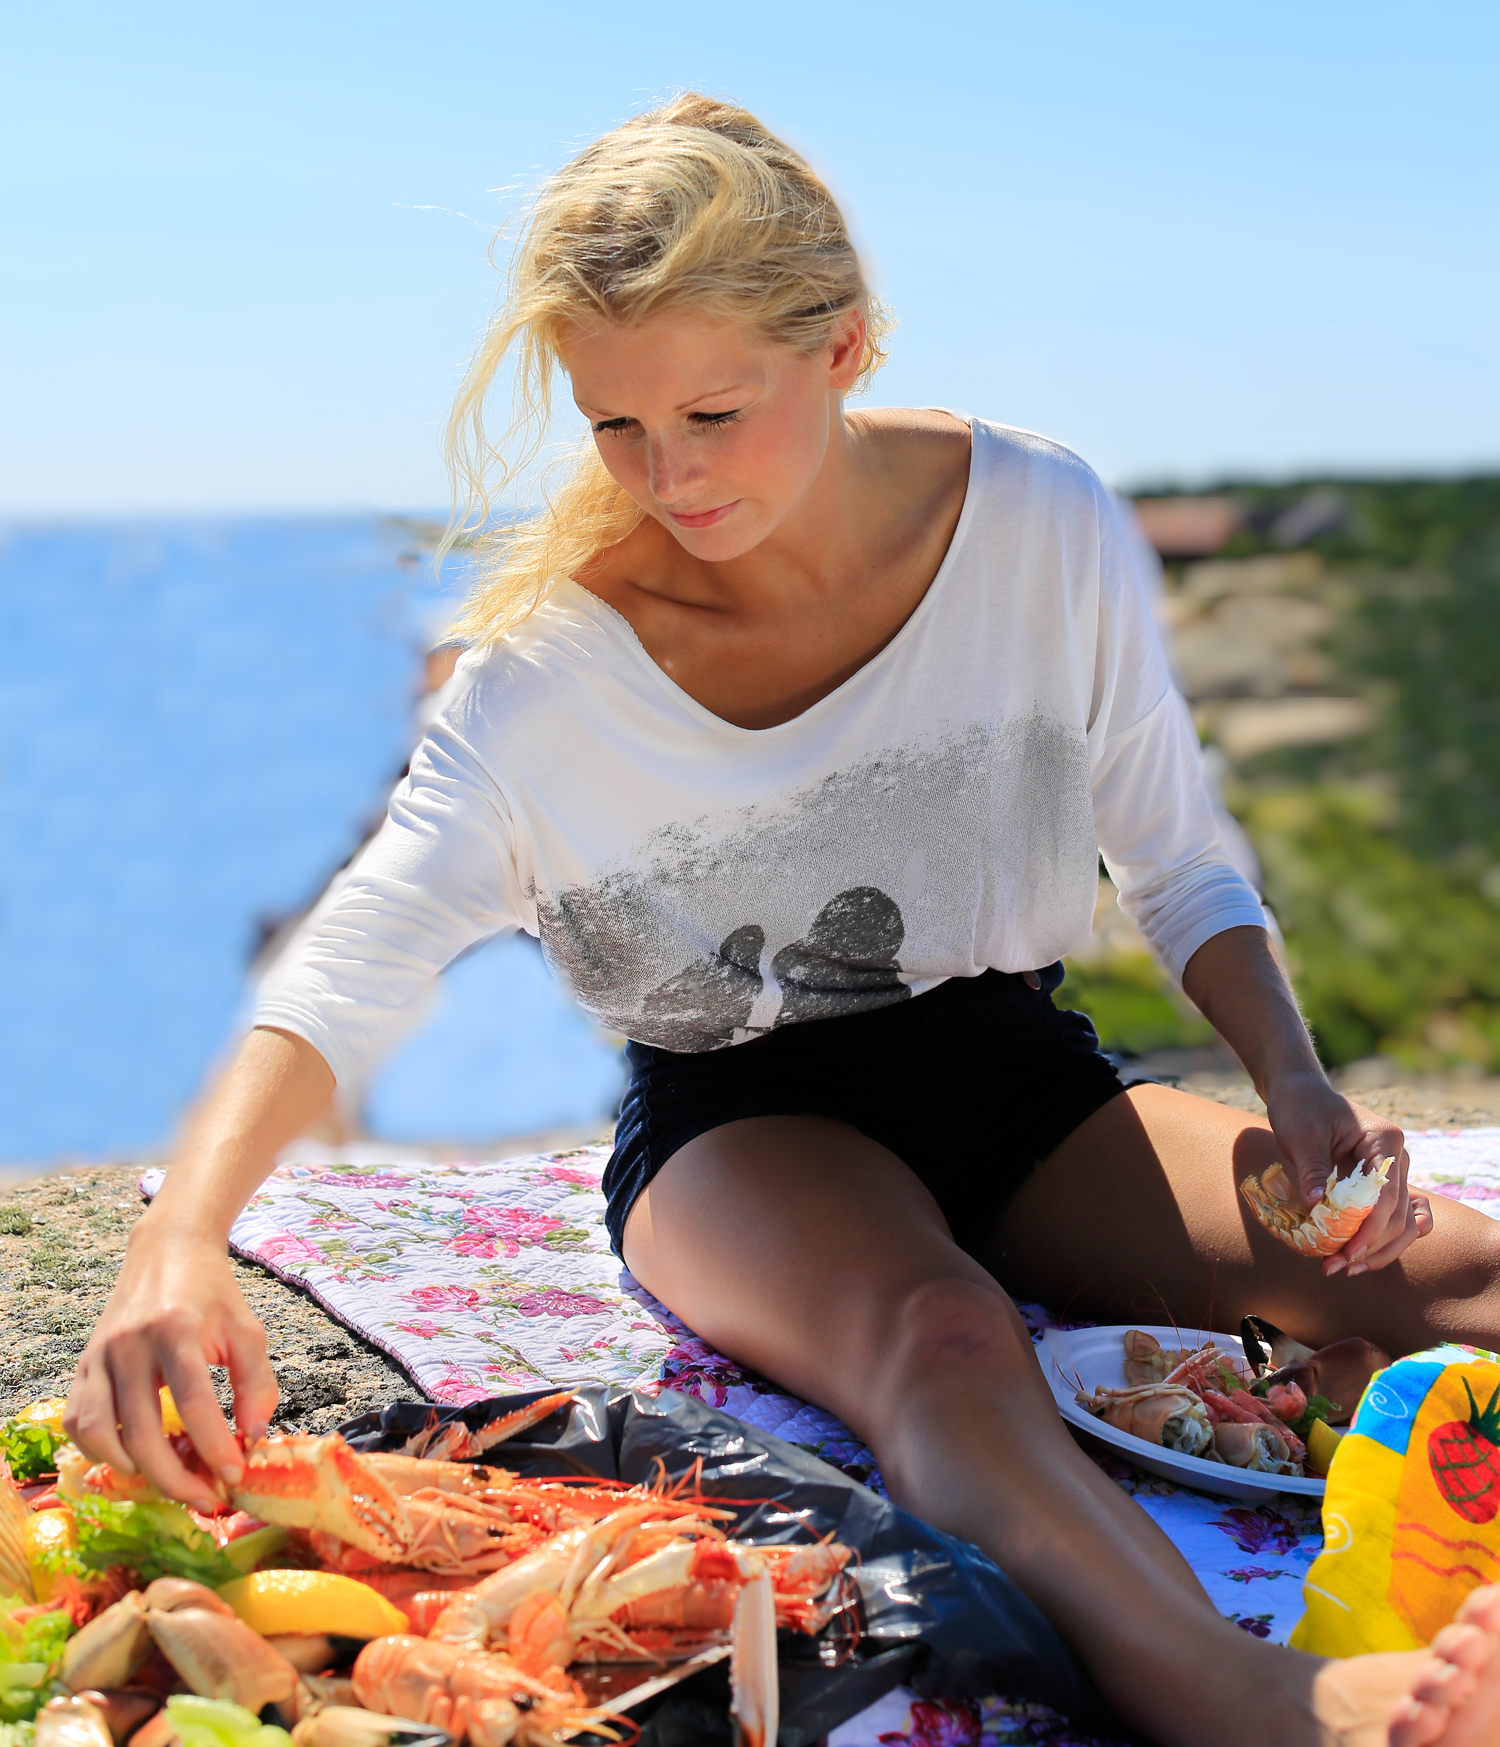 Ta en piknik med sjømat langs Brunlaneskysten til sommeren.